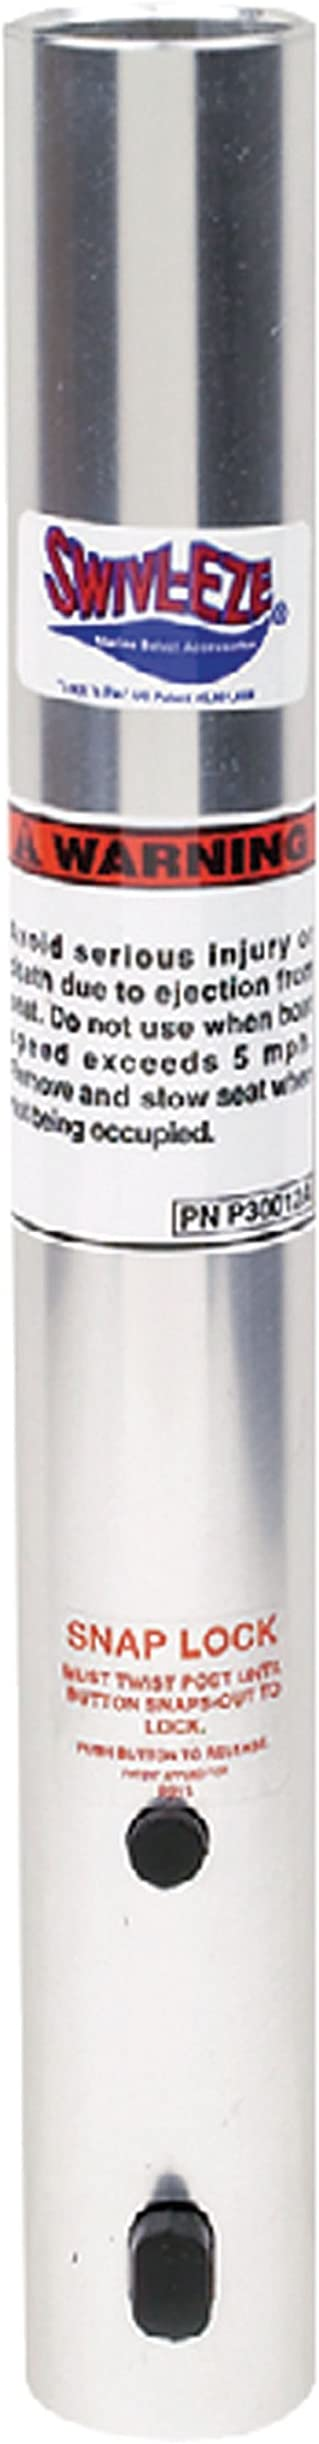 "Swivl-Eze Sp29130 Snap-Lock Pedestal Posts 13/"""